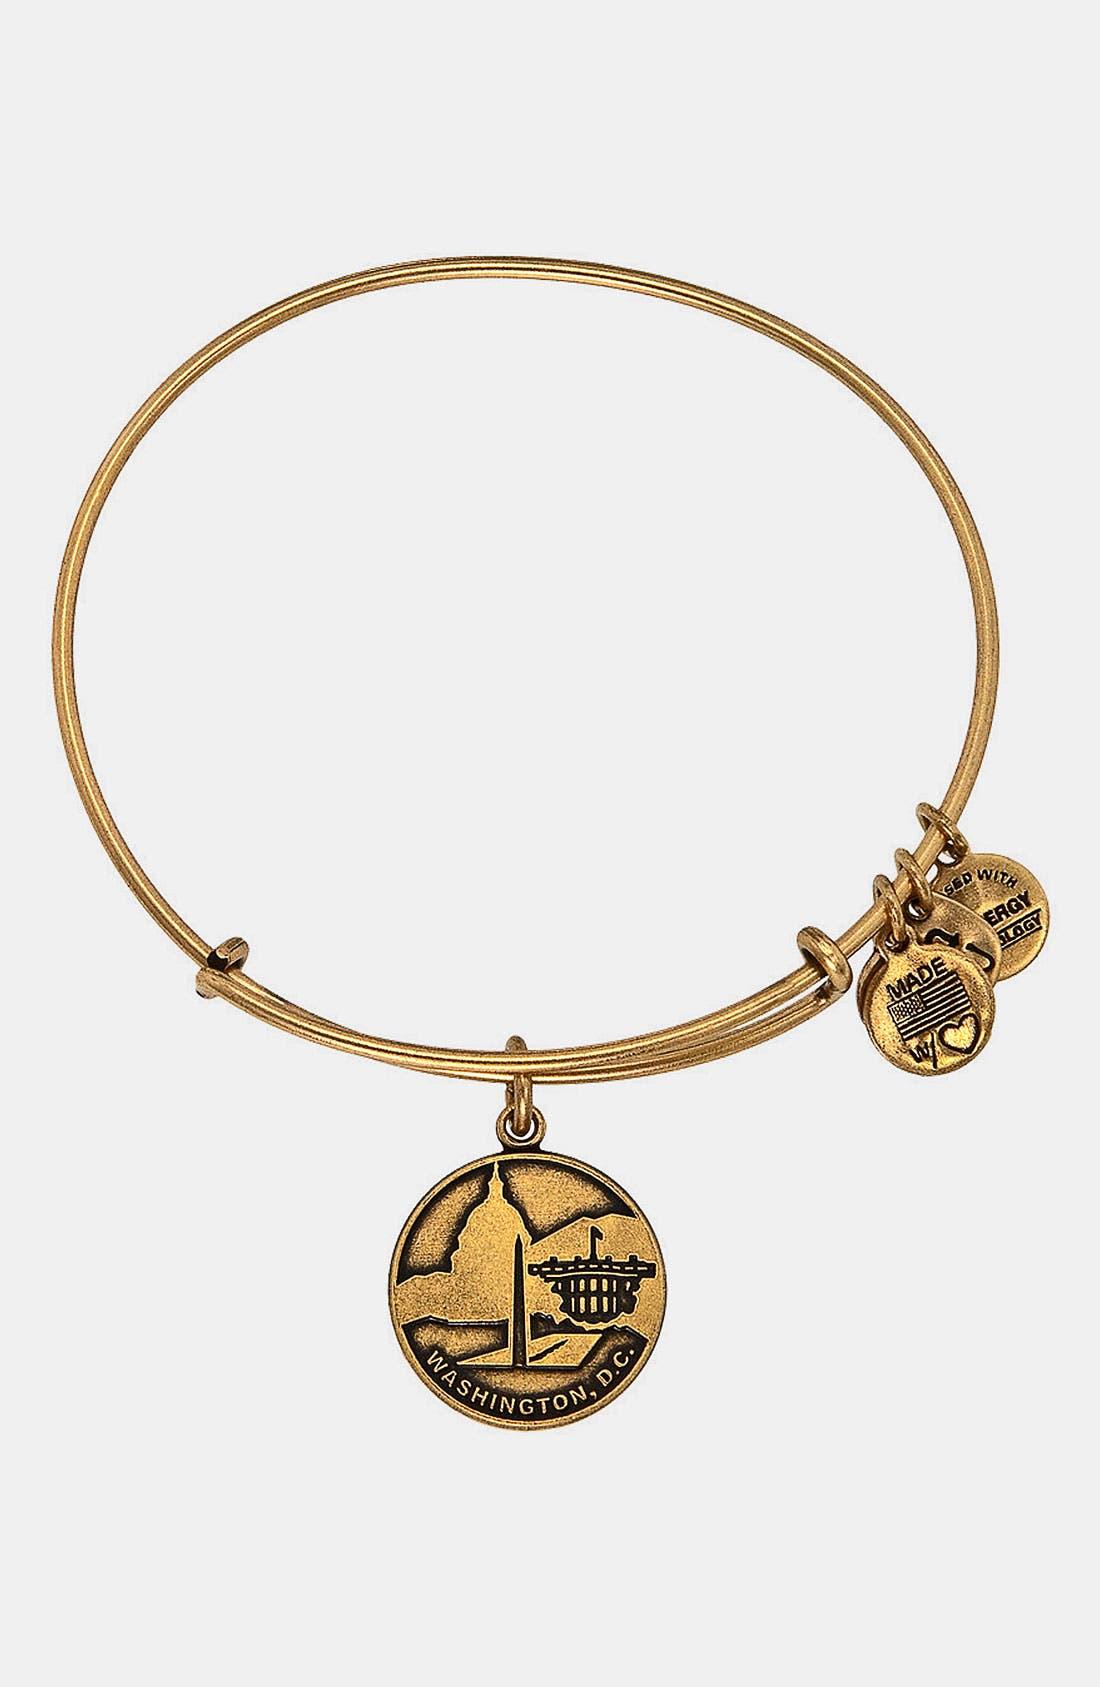 Alternate Image 1 Selected - Alex and Ani 'Washington DC' Expandable Wire Bracelet